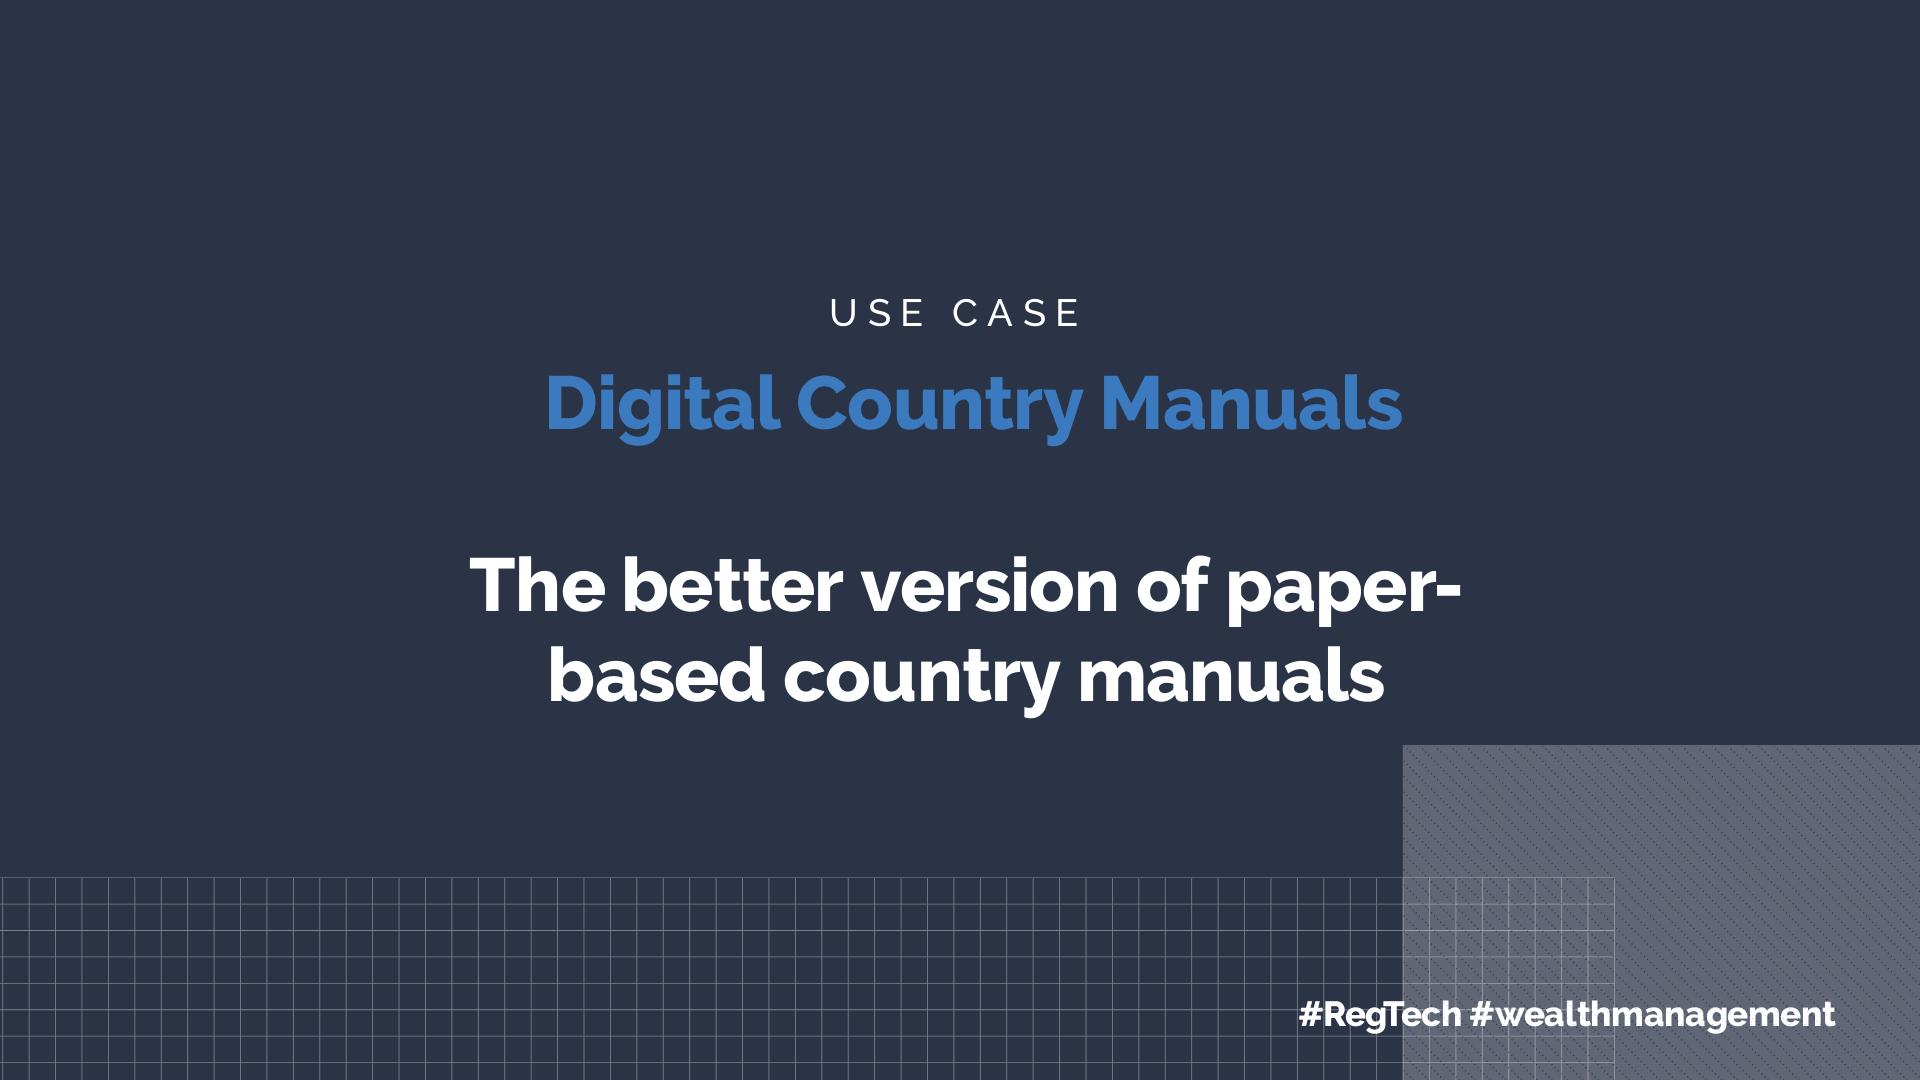 Digital Country Manuals